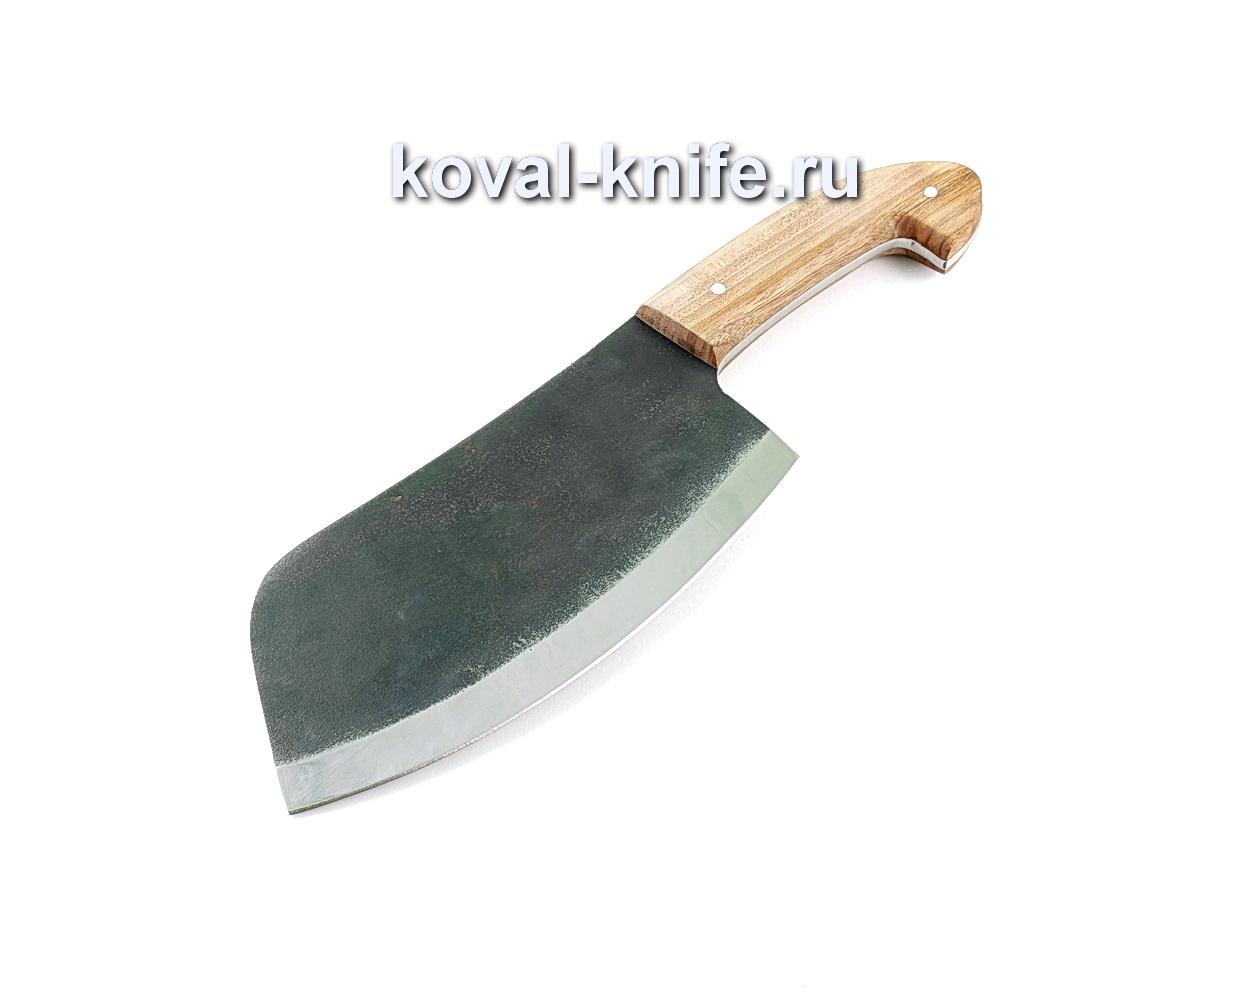 Тяпка (сталь 95х18), рукоять орех A181